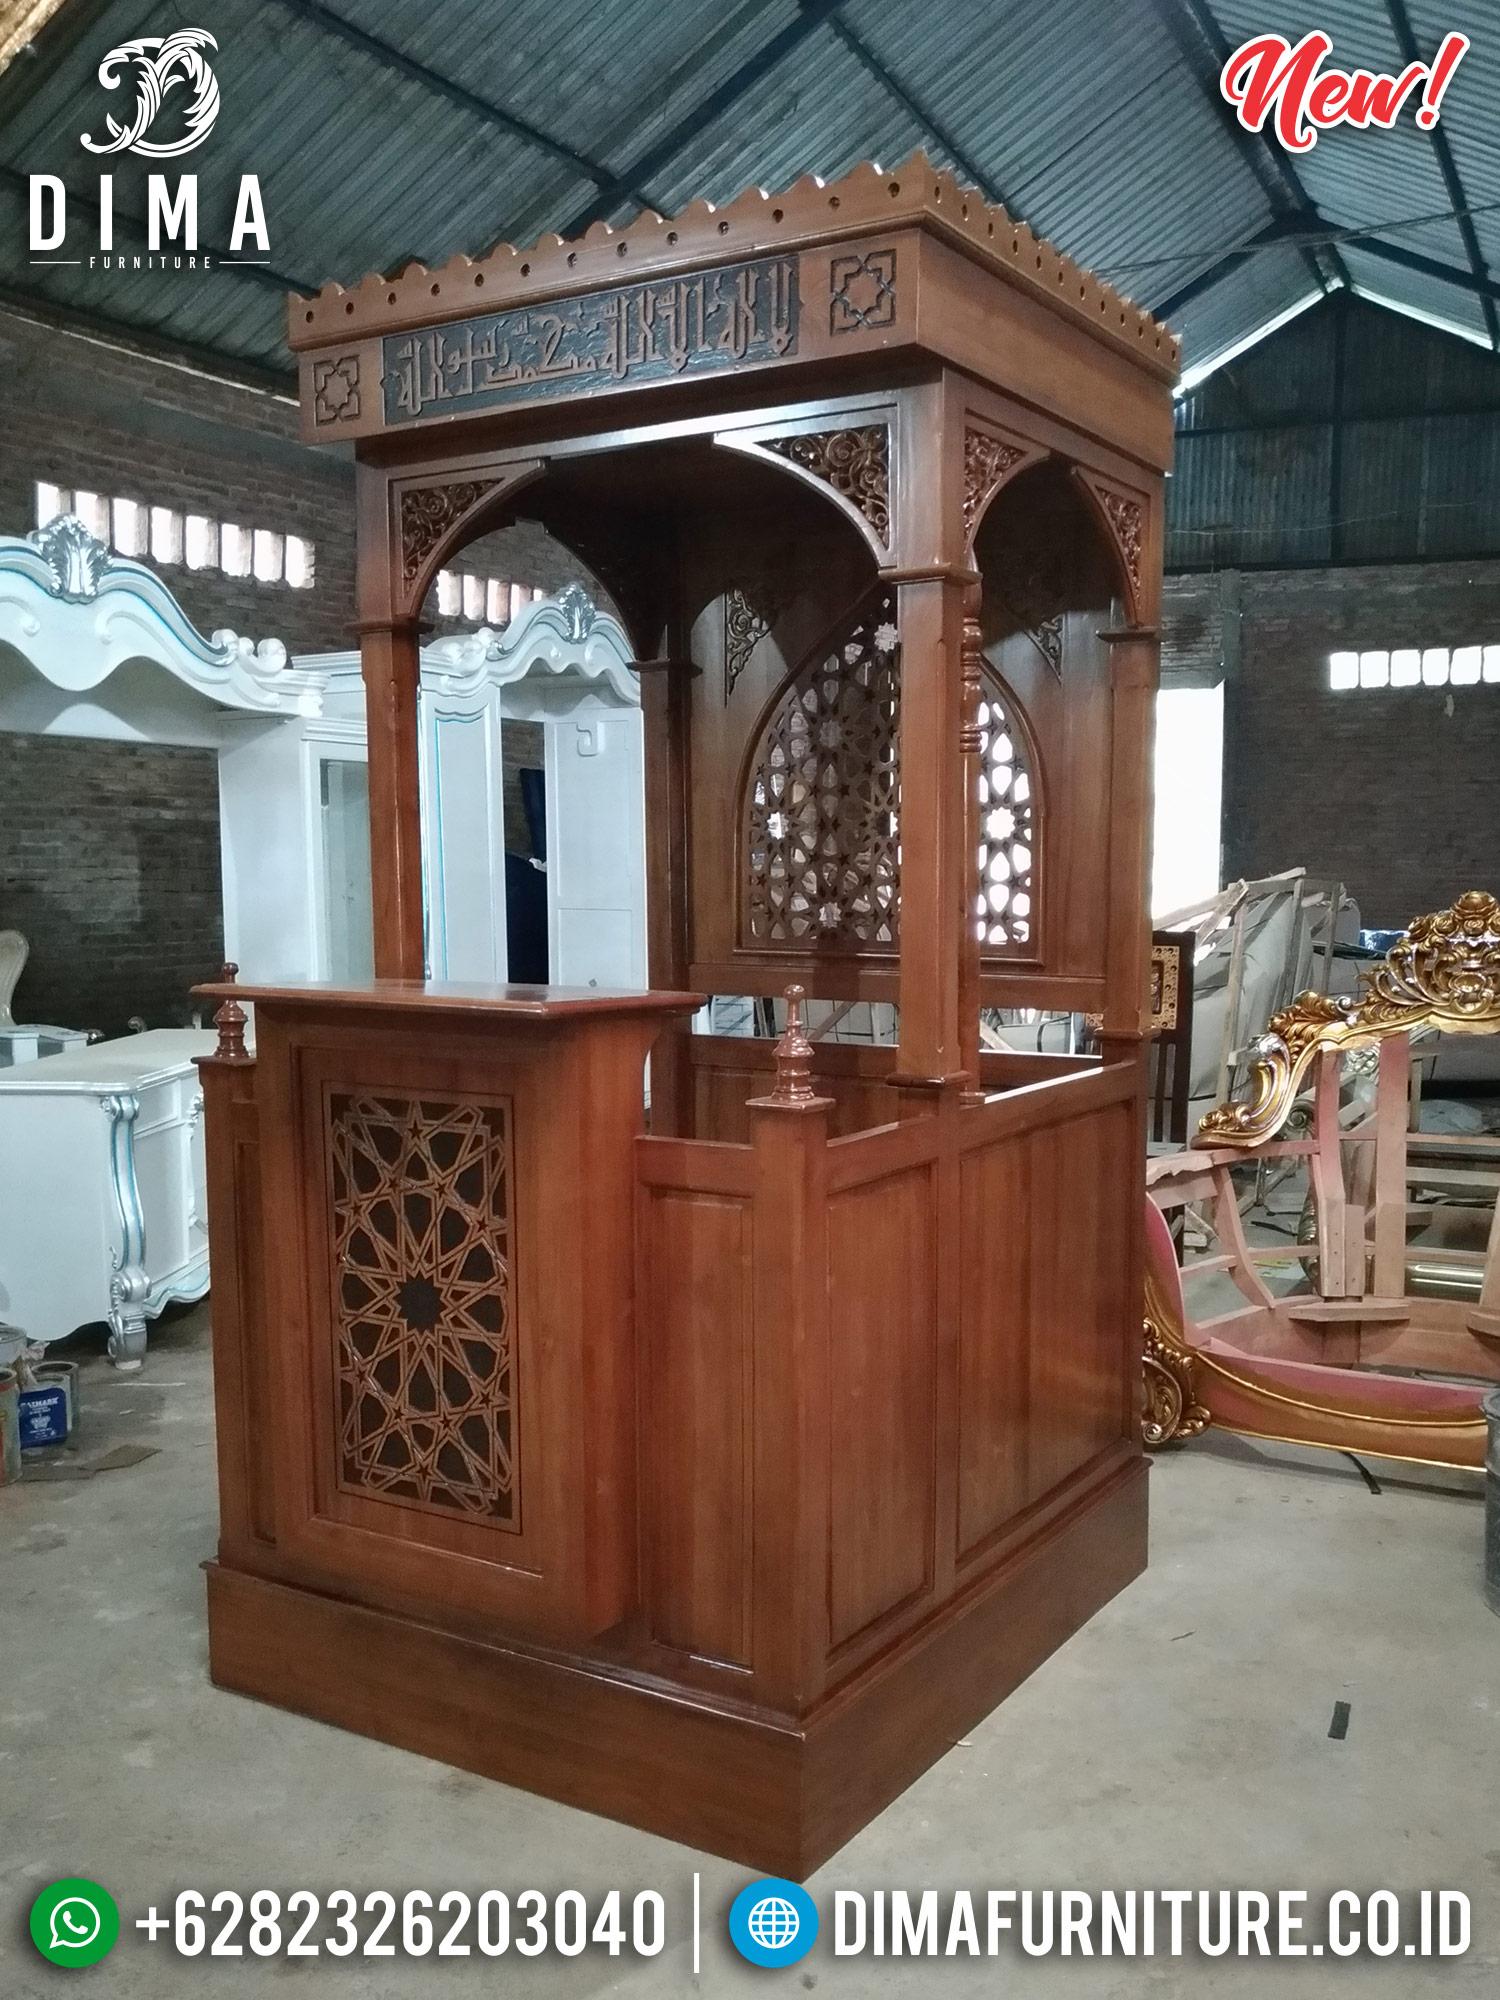 Mimbar Masjid Jepara Jati Minimalis Terbaru Natural MMJ-0203 Gambar 2